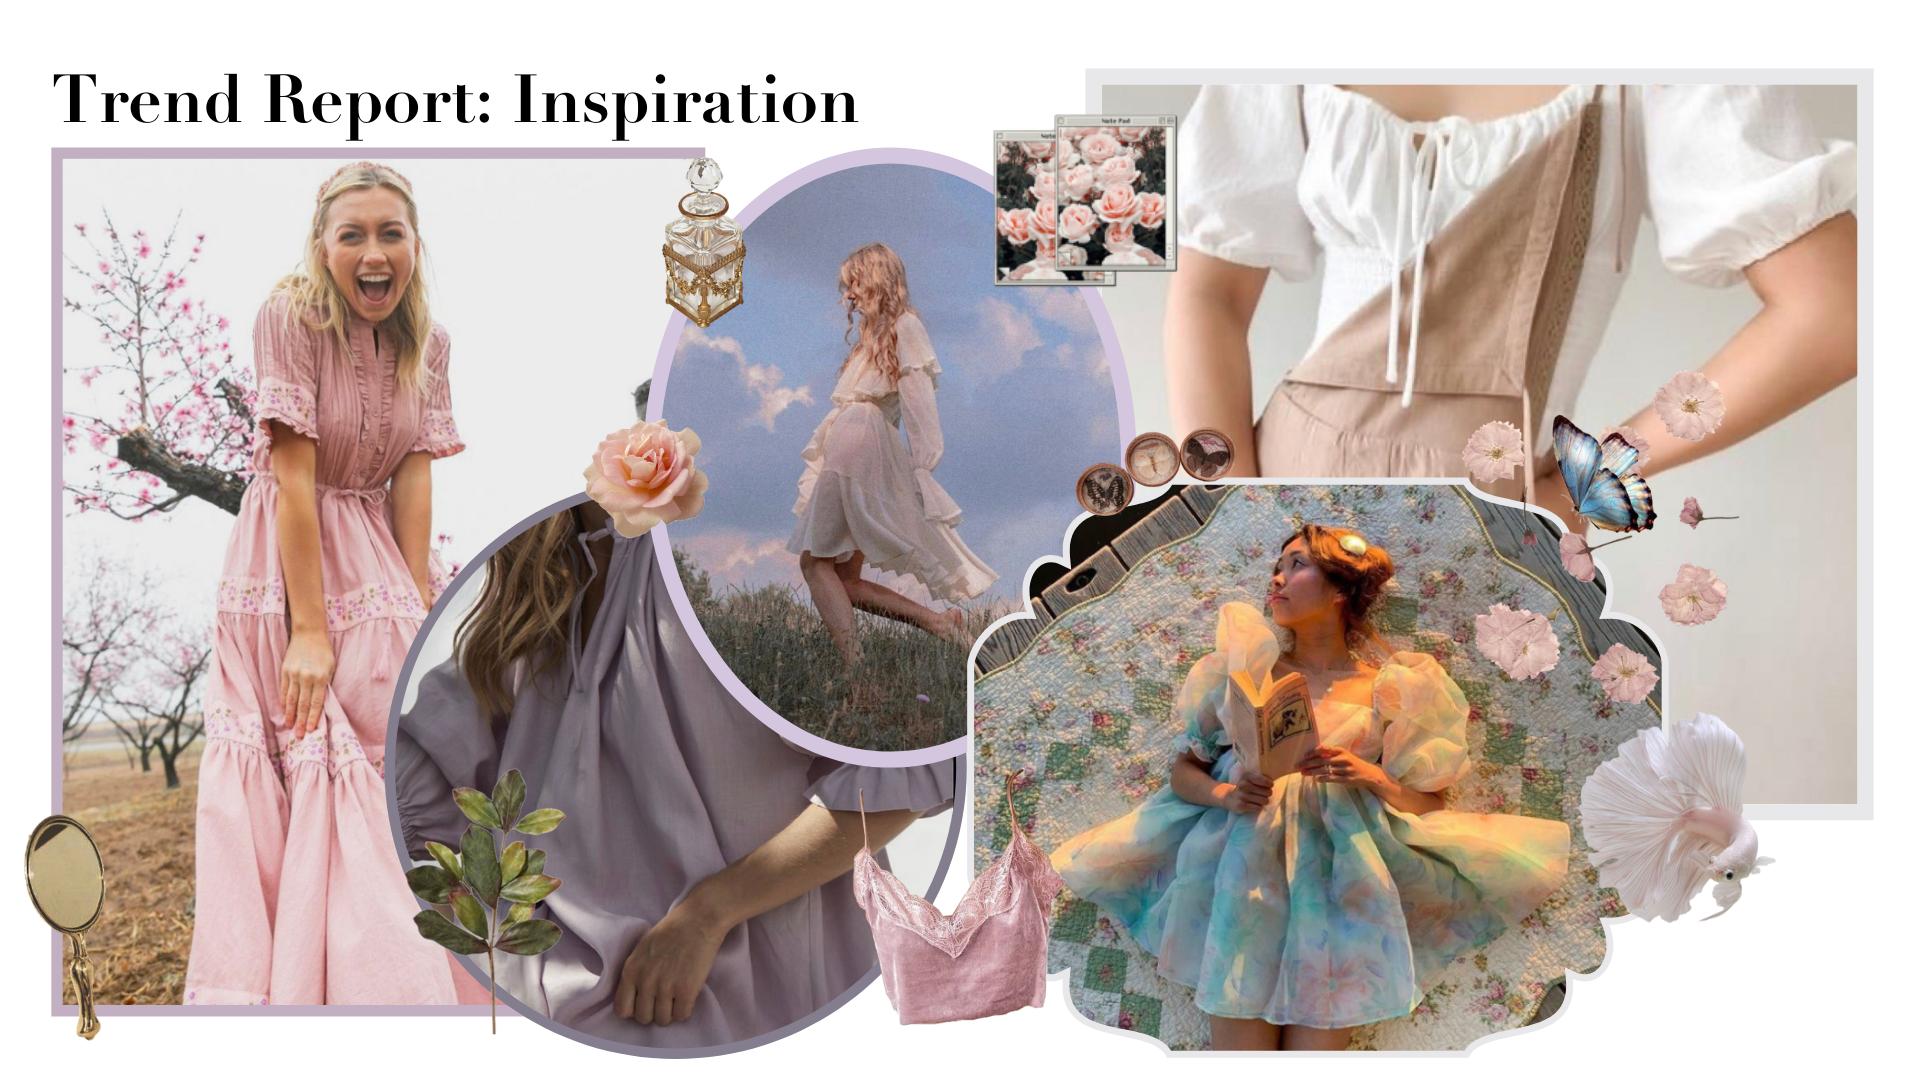 Trend Report: Inspiration